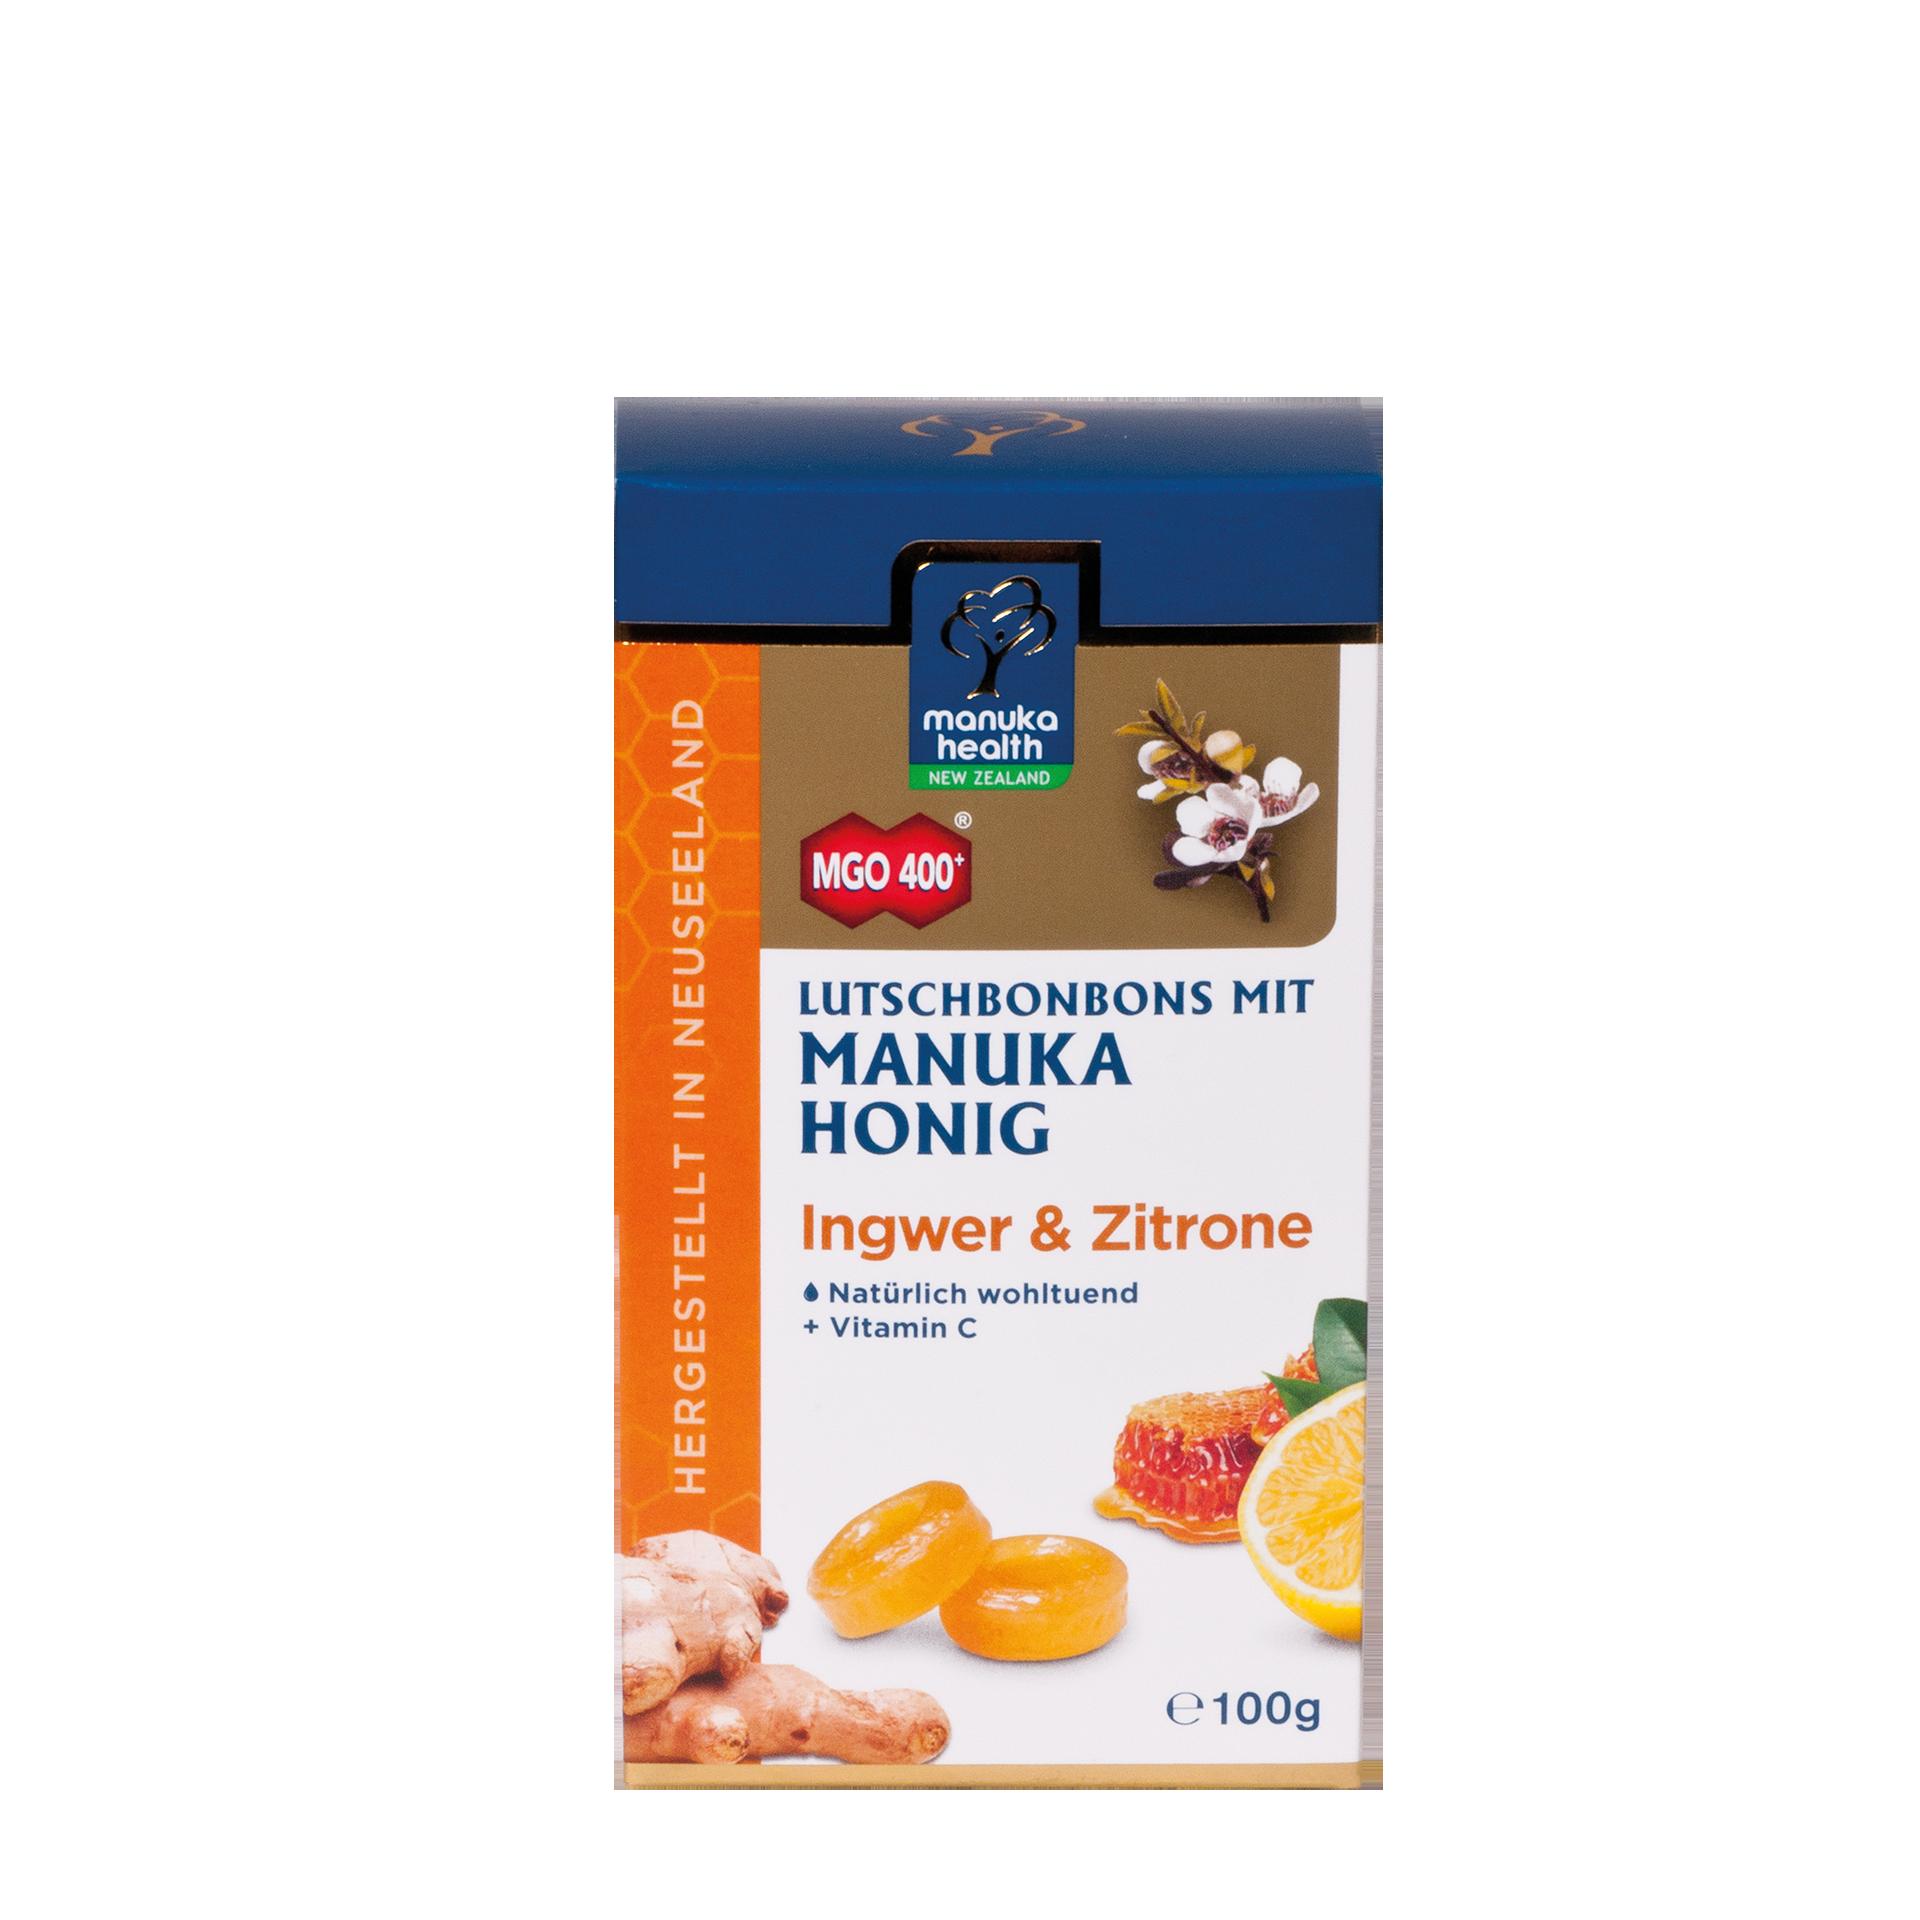 Manuka-Honig Lutschbonbons, Ingwer & Zitrone, 100g